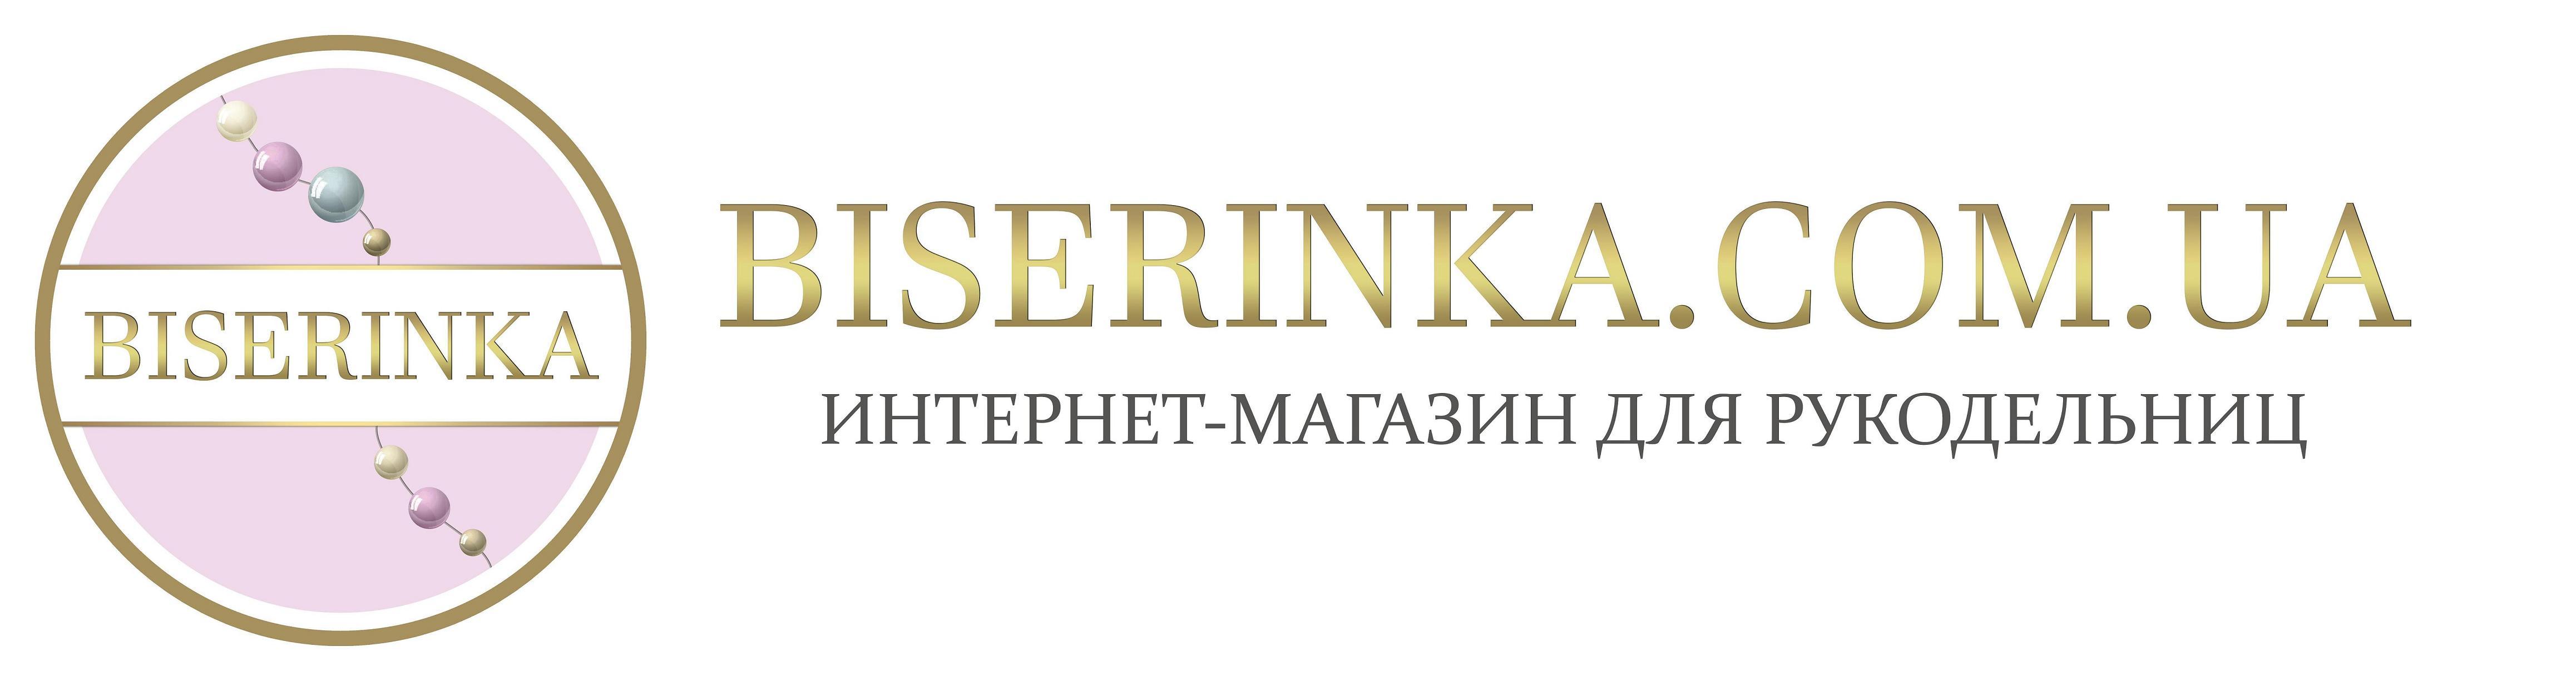 Интернет-магазин Бисеринка (Biserinka.com.ua)